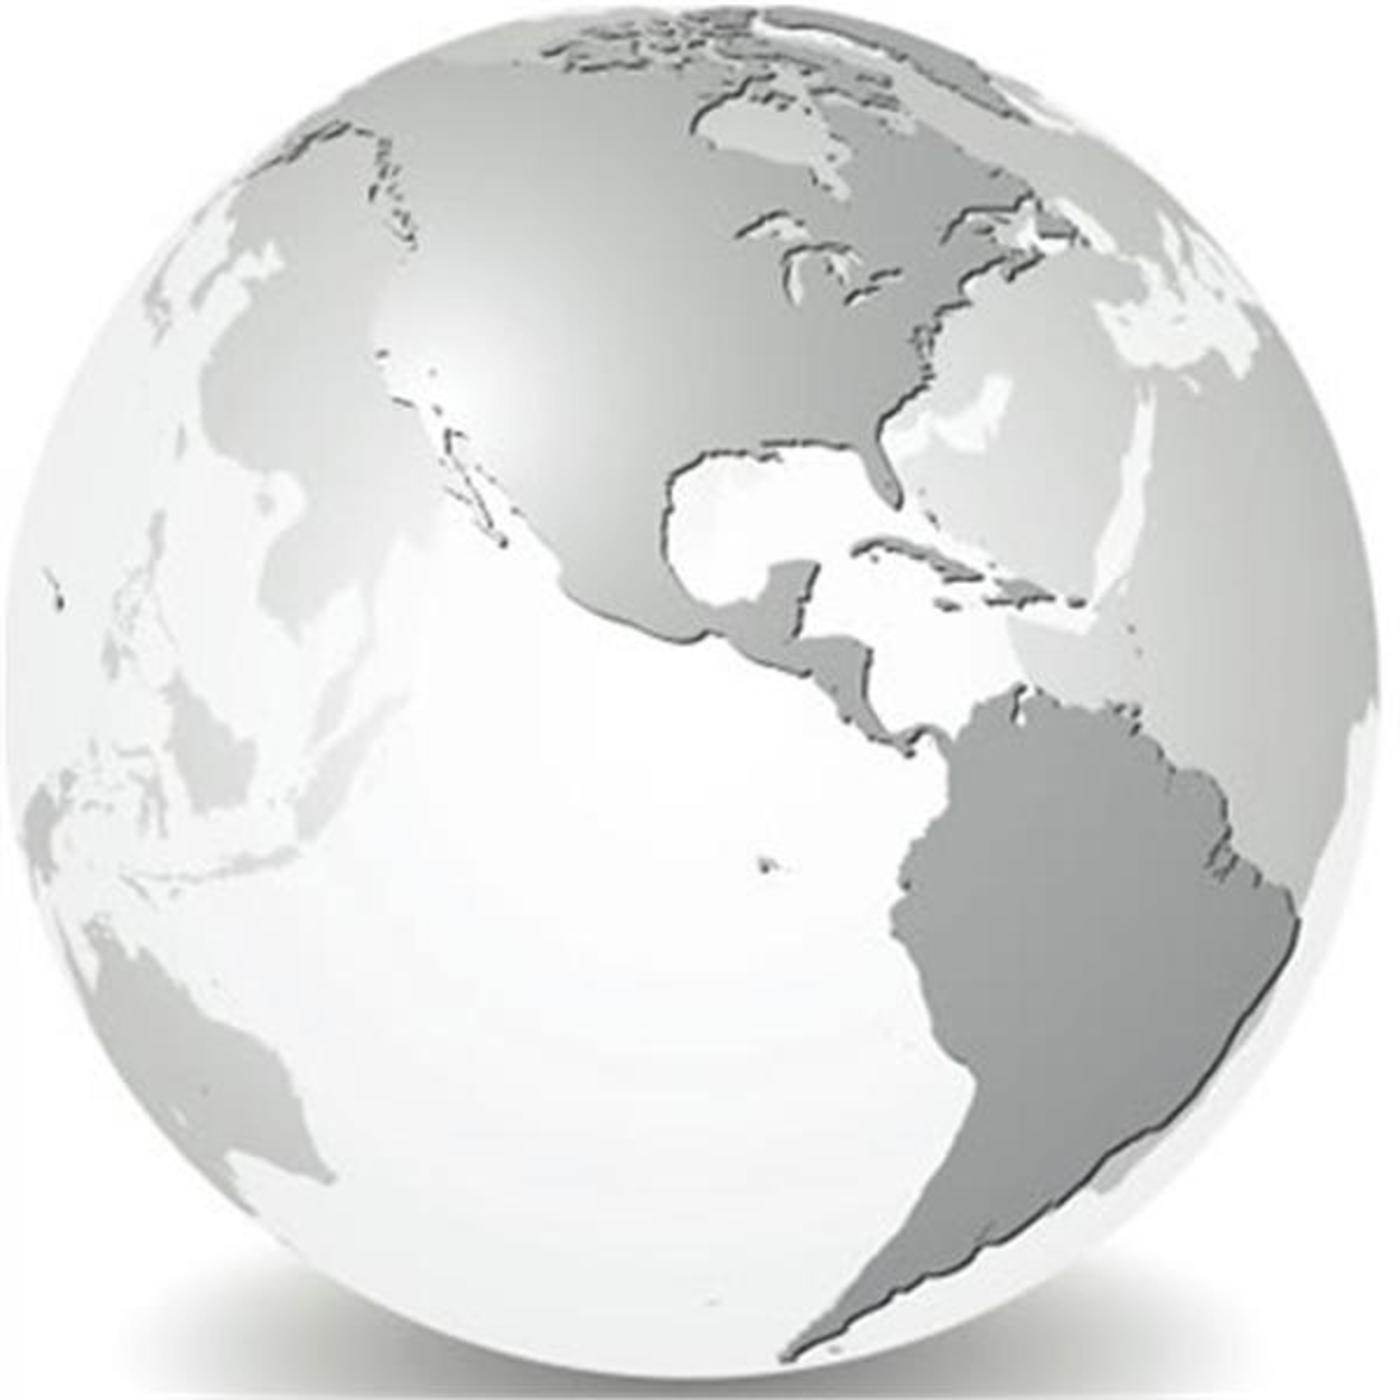 Global Paranormal Network